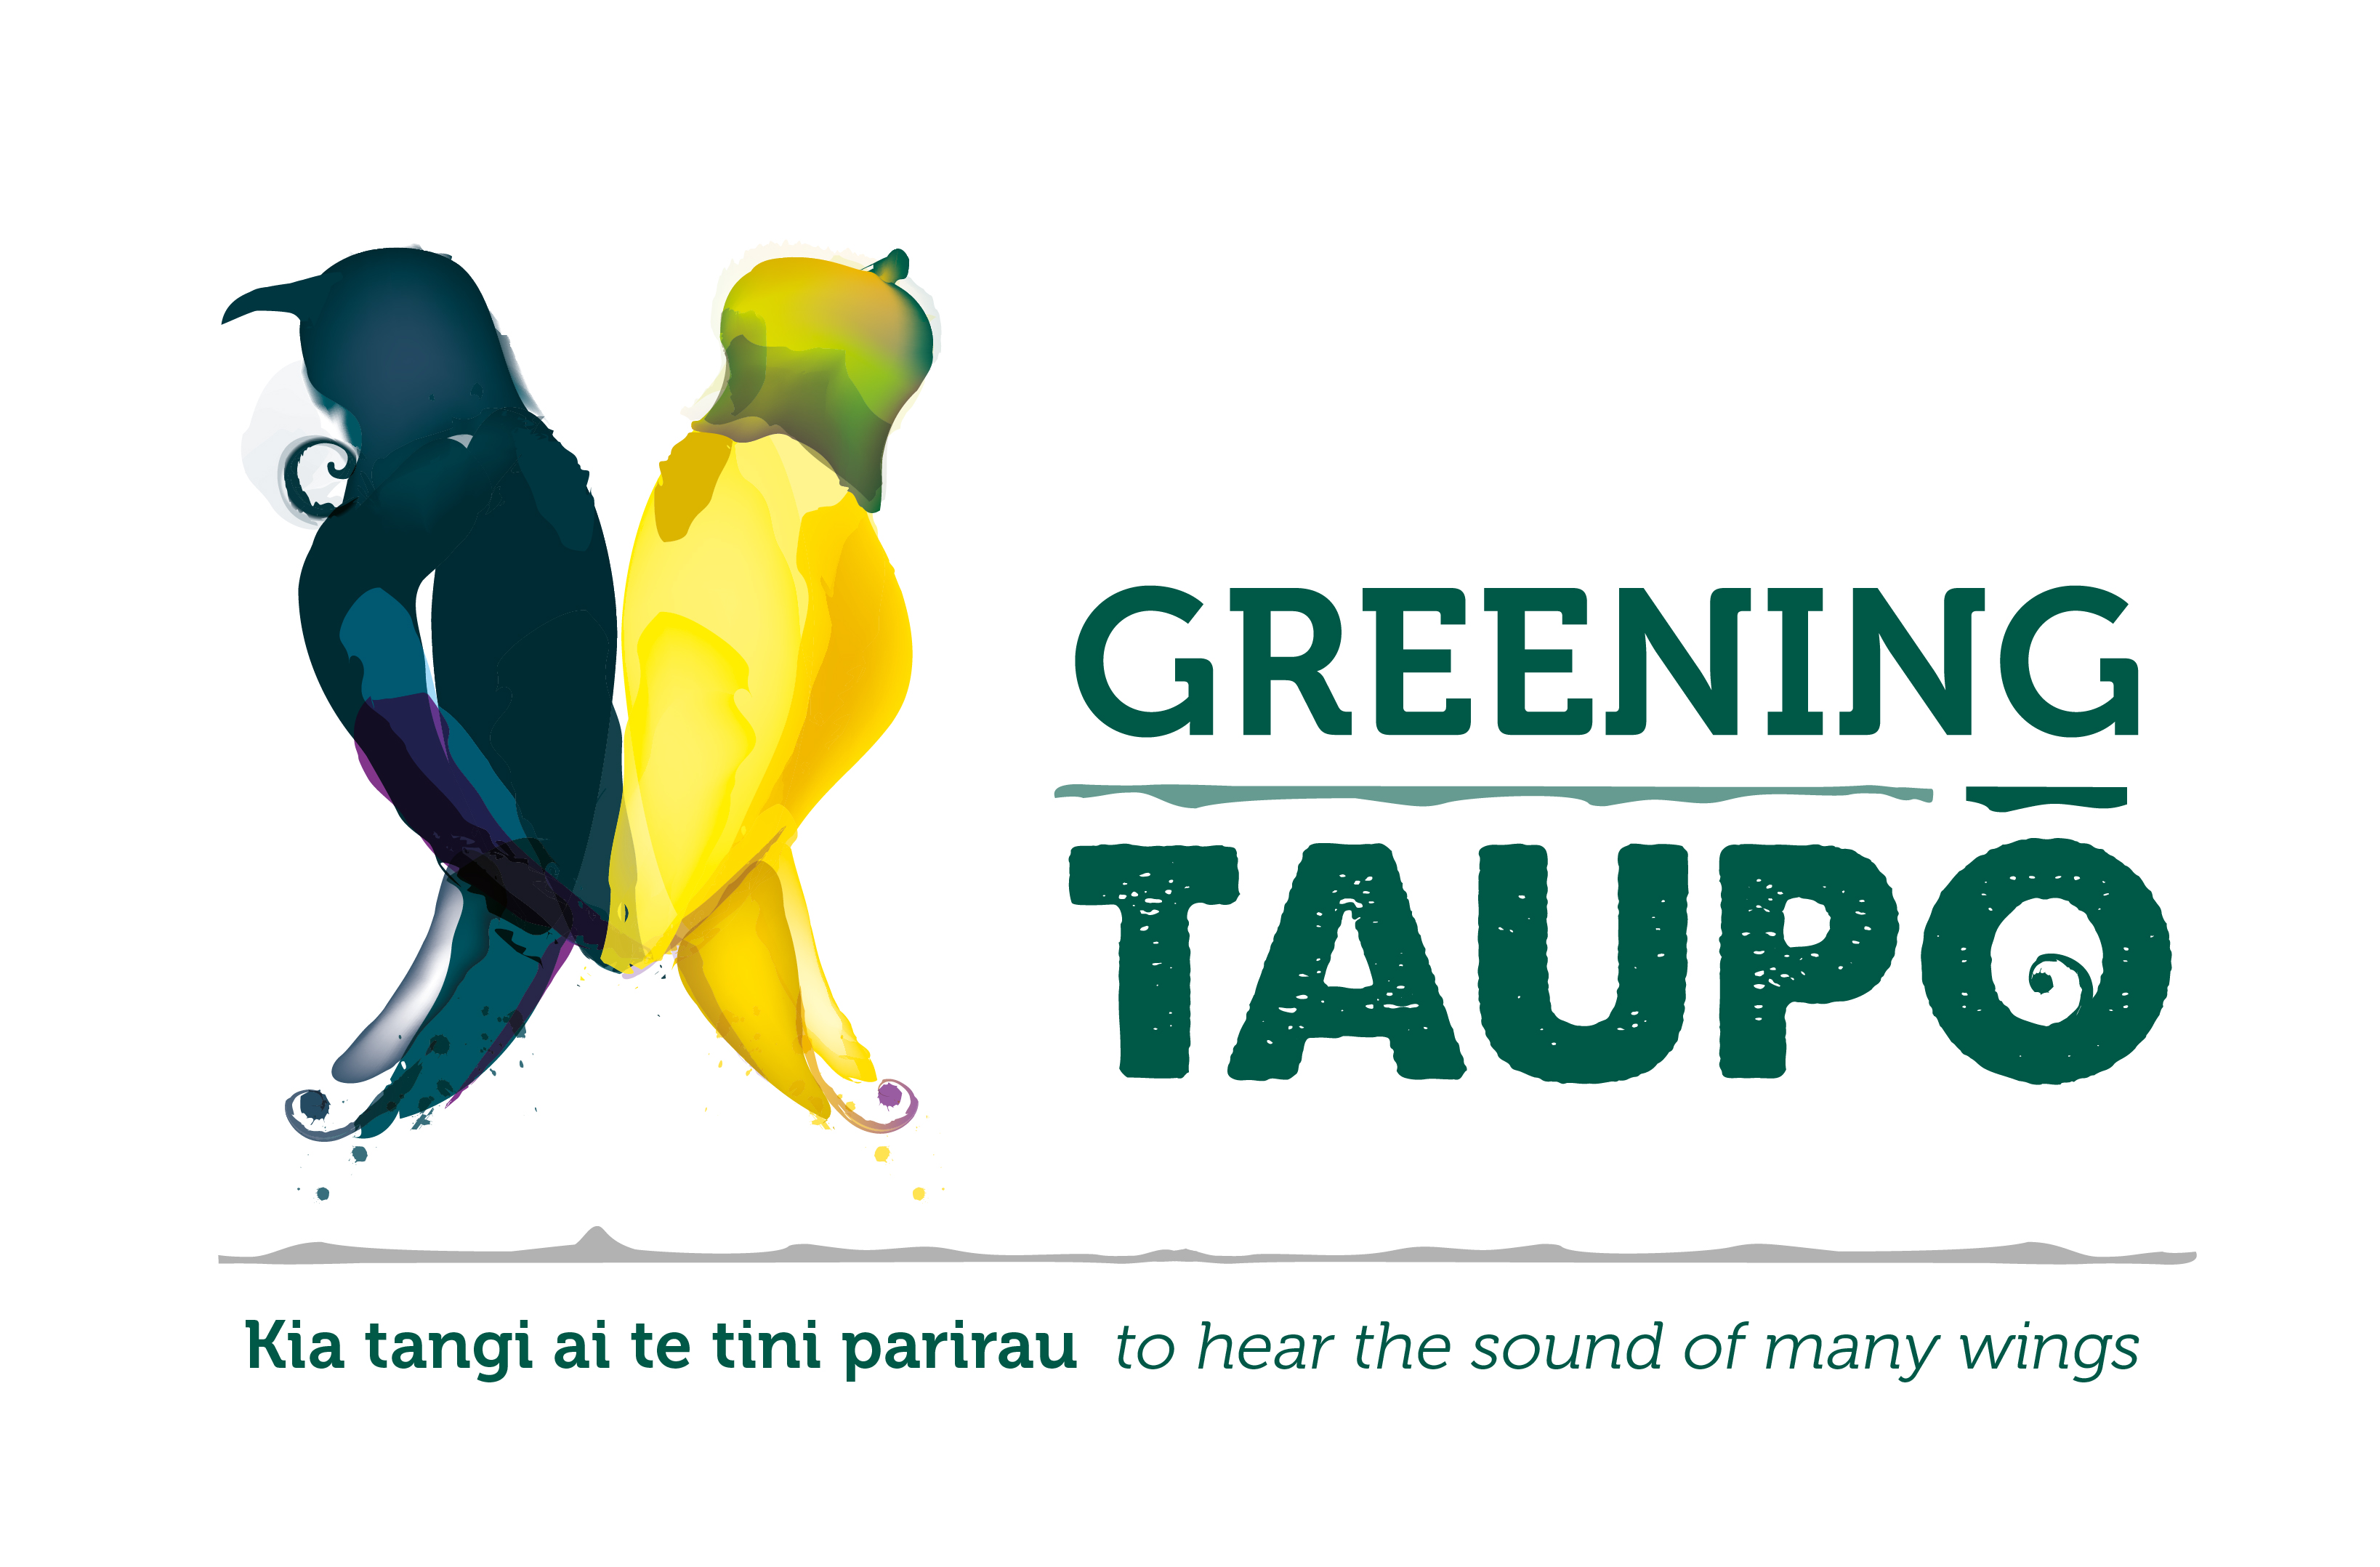 Greening Taupō